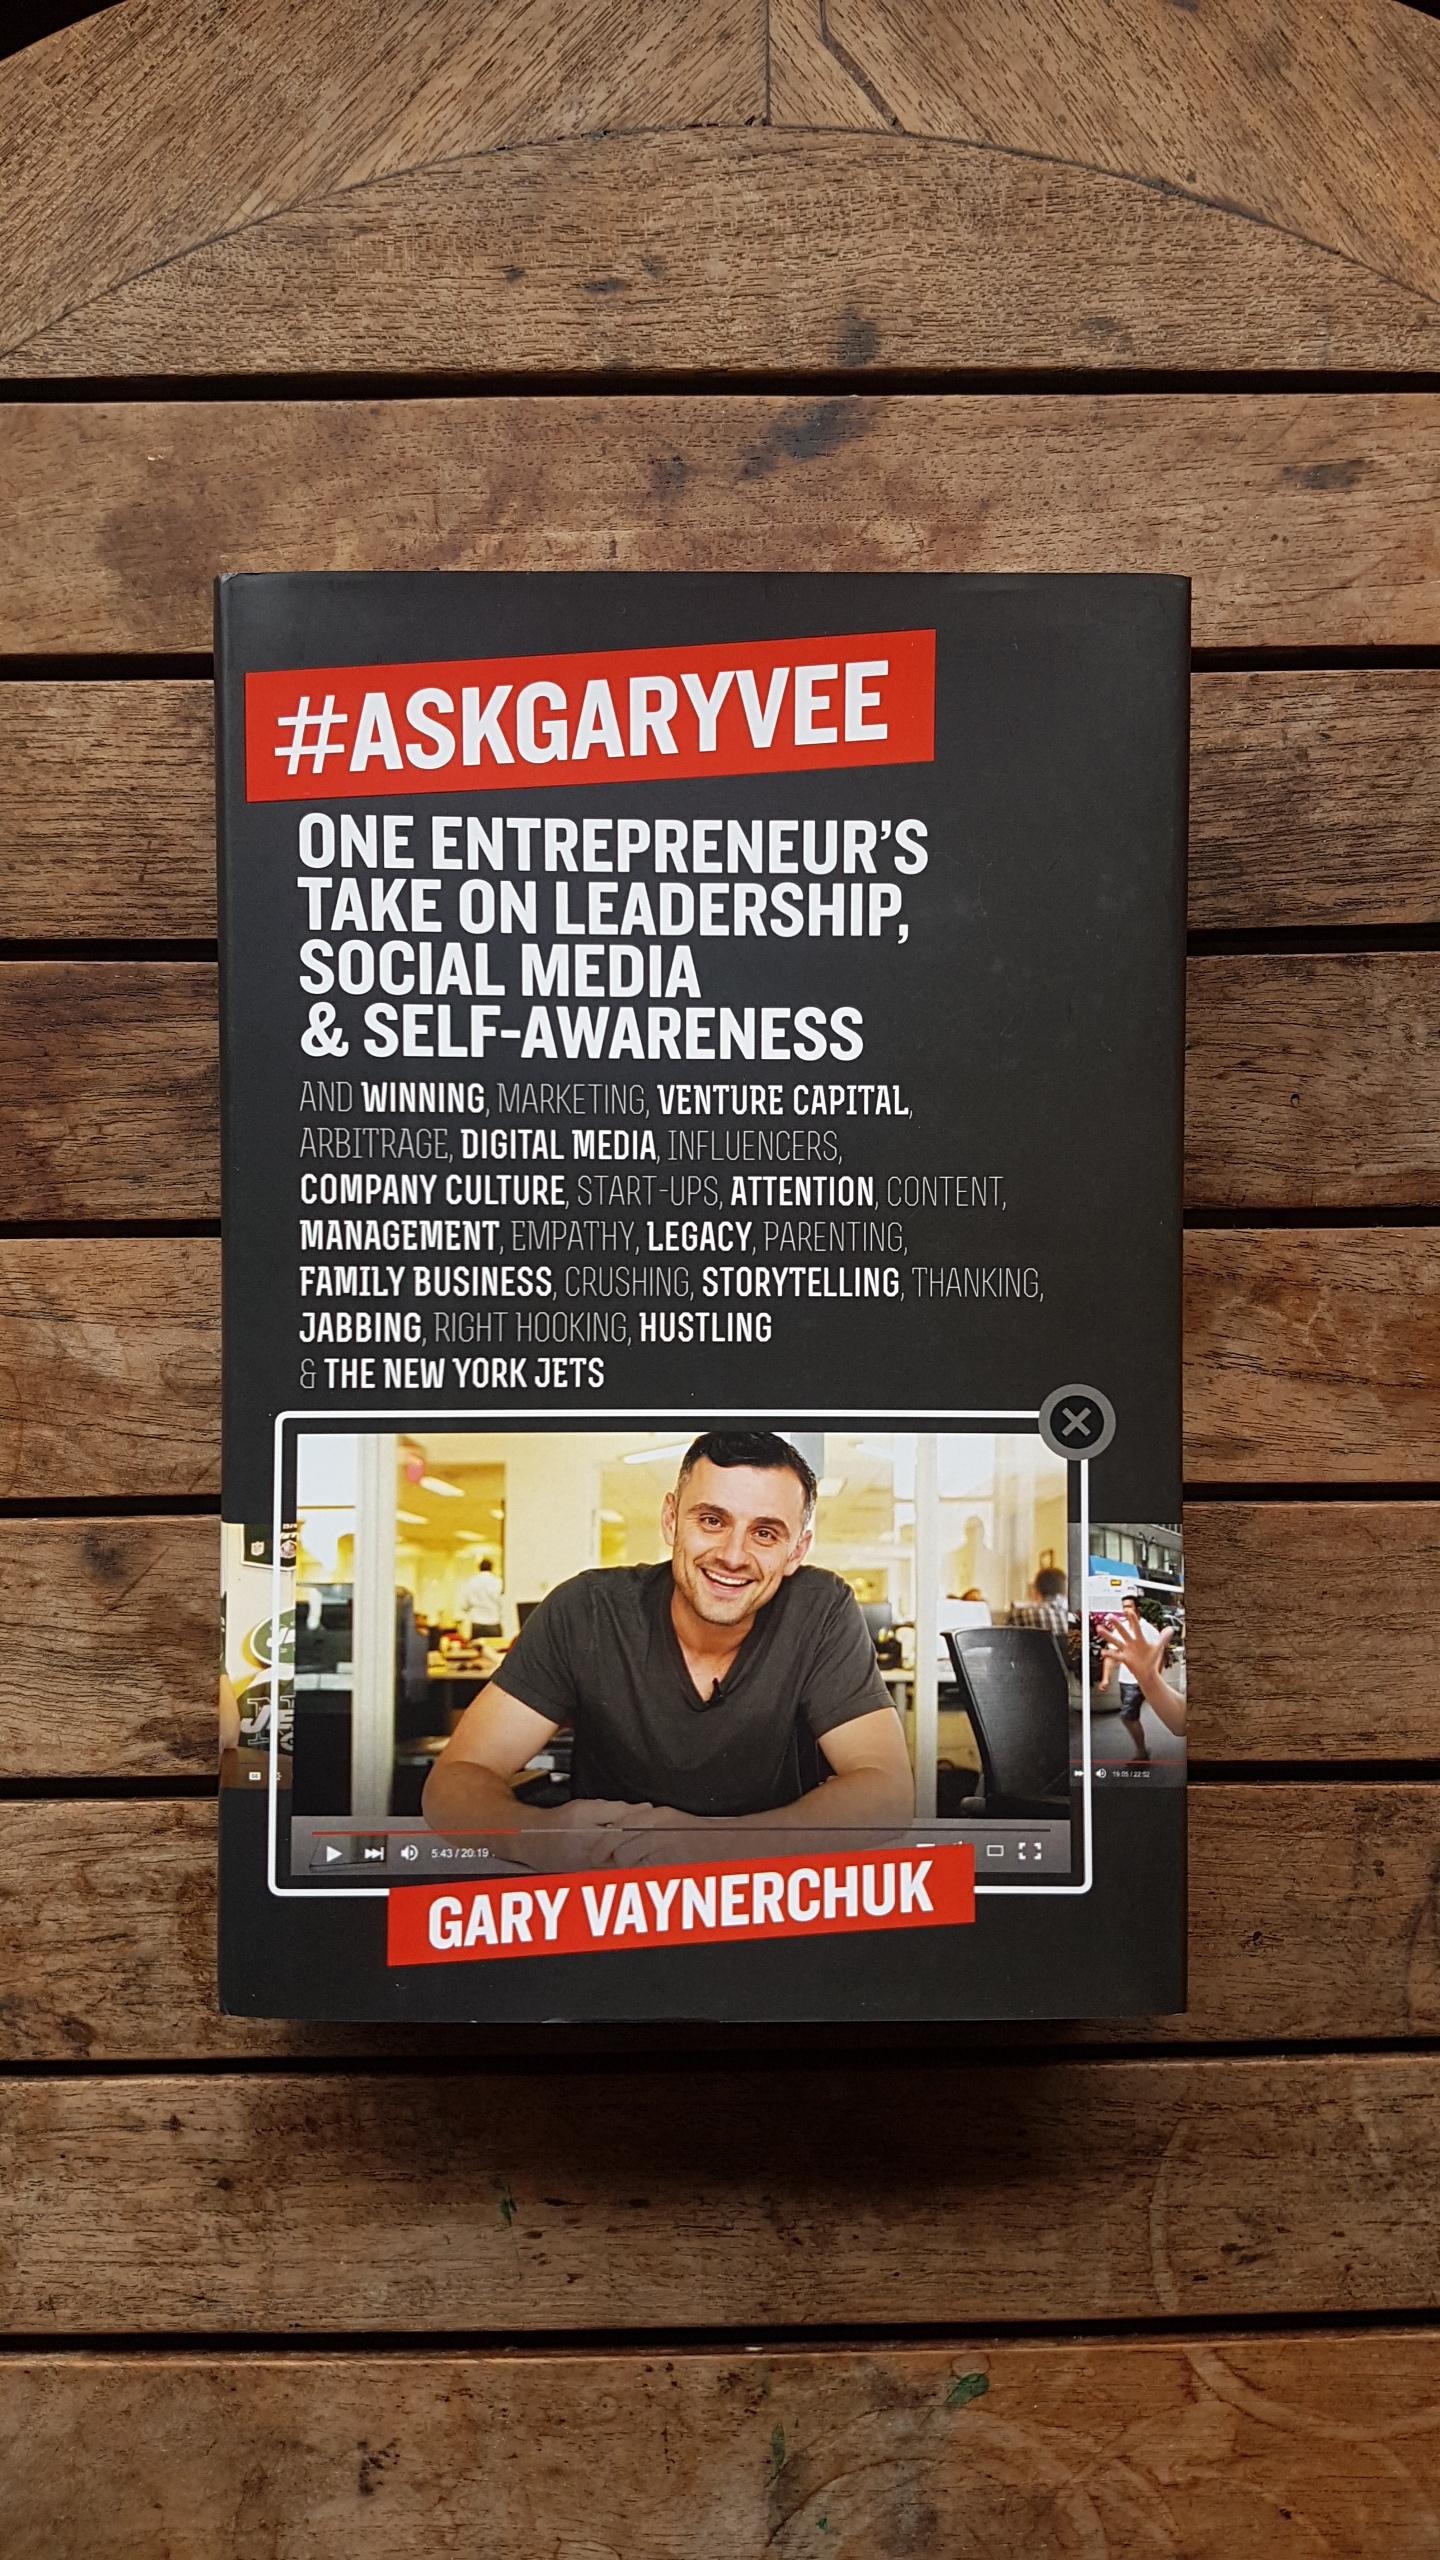 #AskGaryVee: One Entrepreneur's Take on Leadership, Social Media, and Self-Awareness   by Gary Vaynerchuk